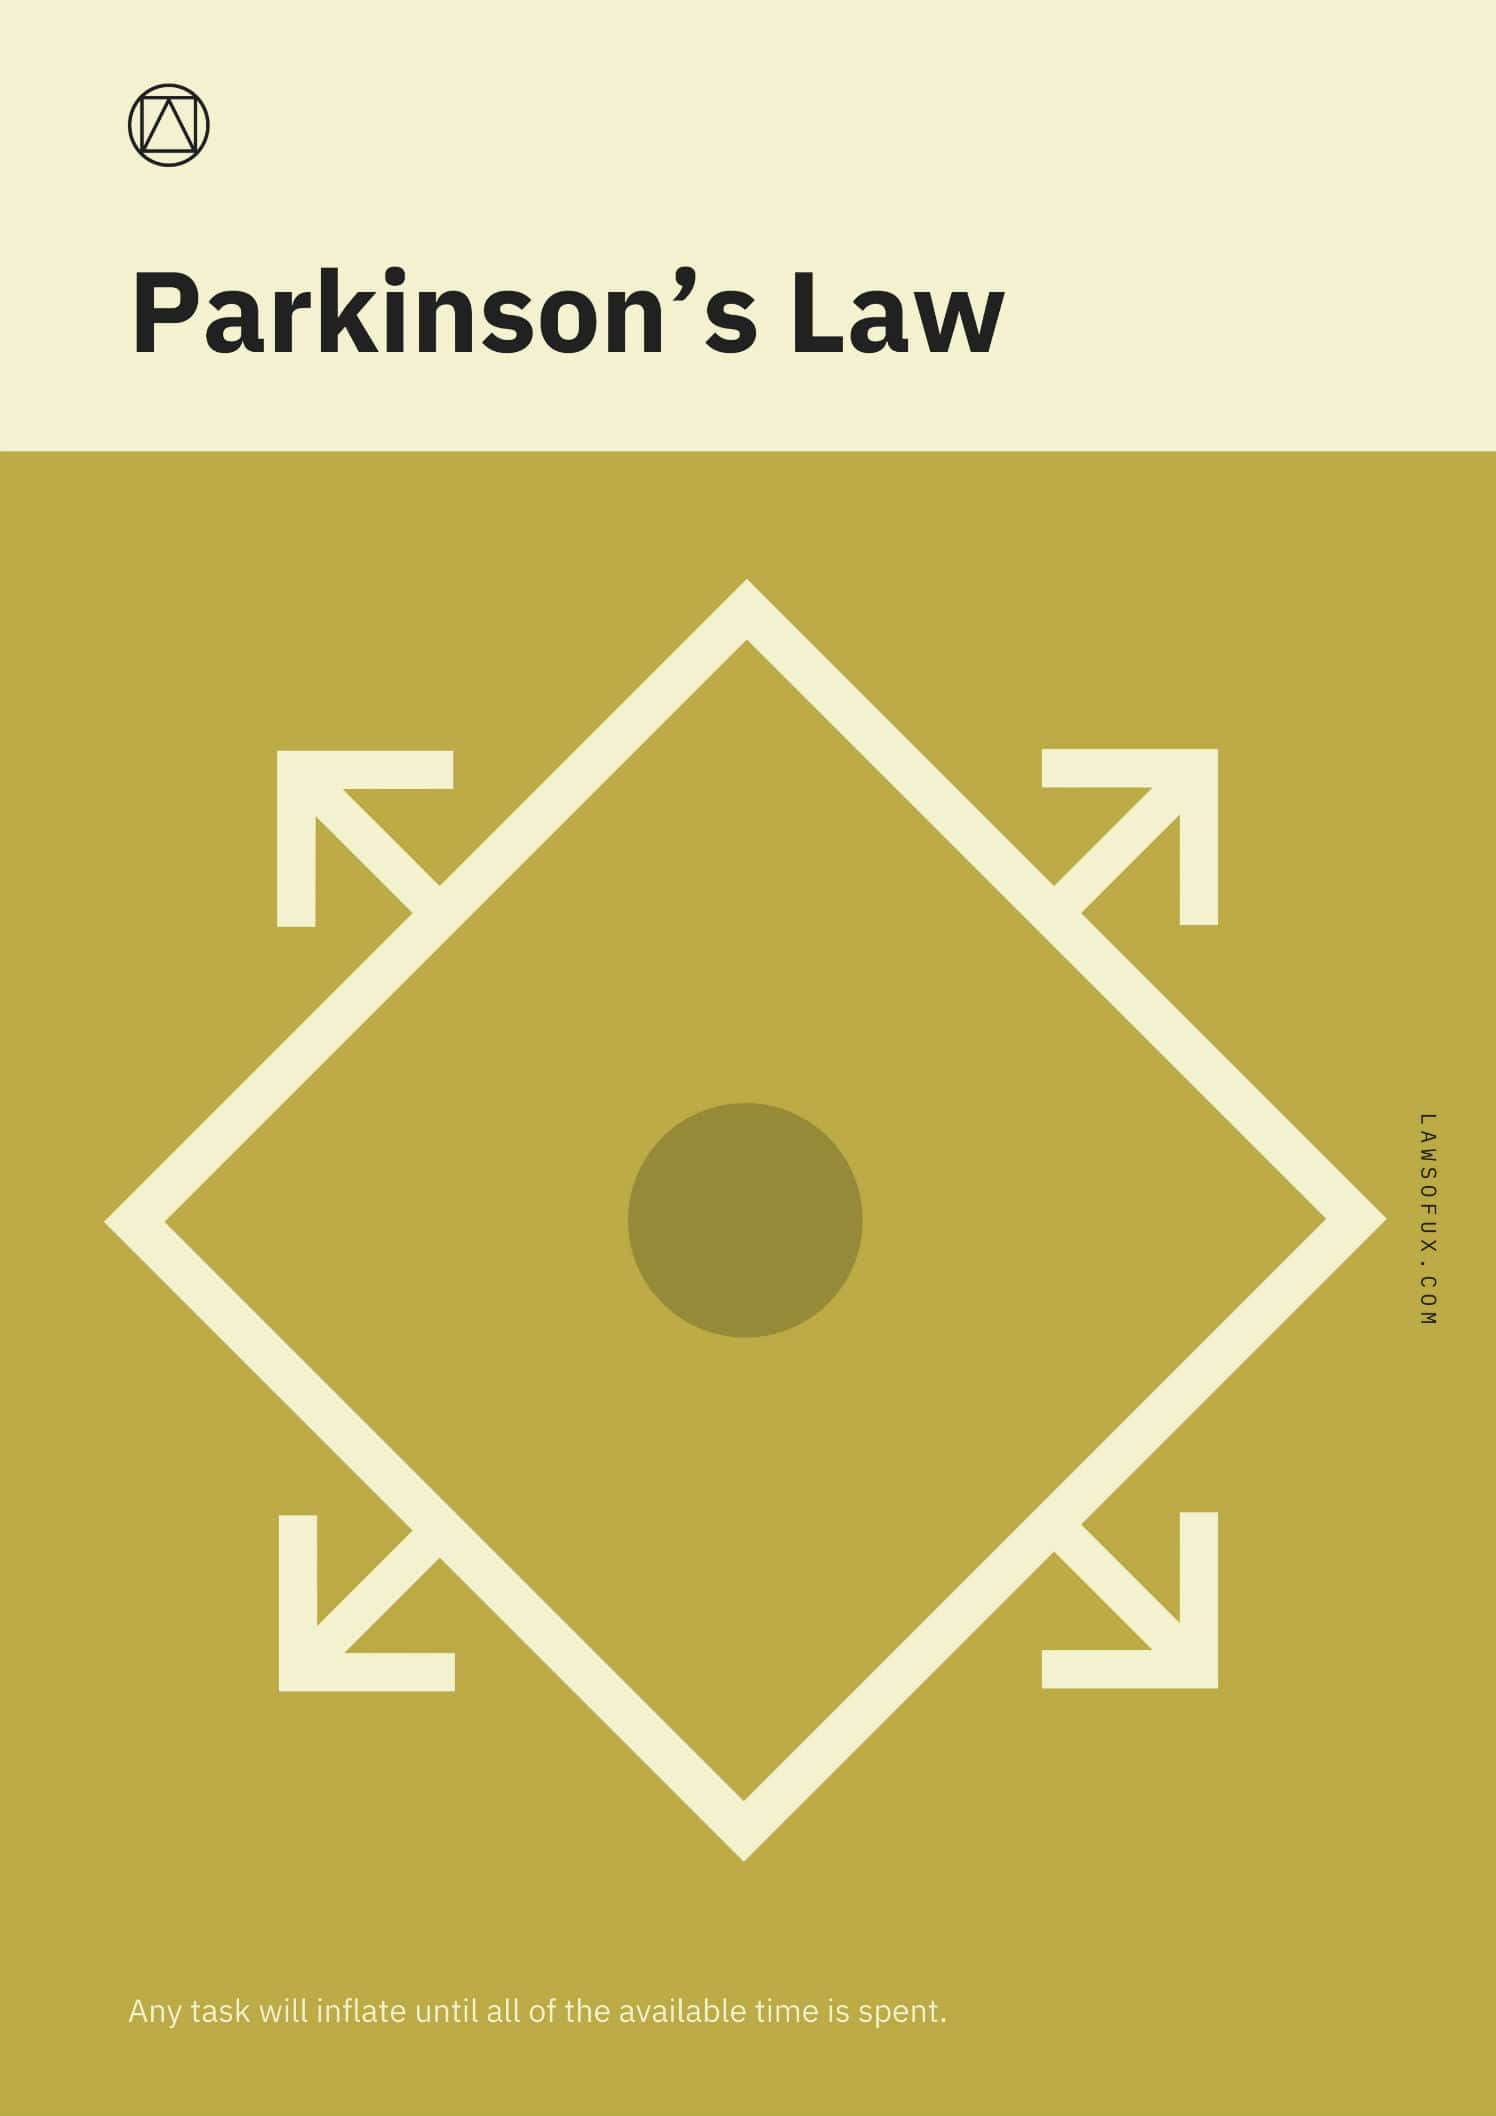 battling parkinsons ux laws - 916×900